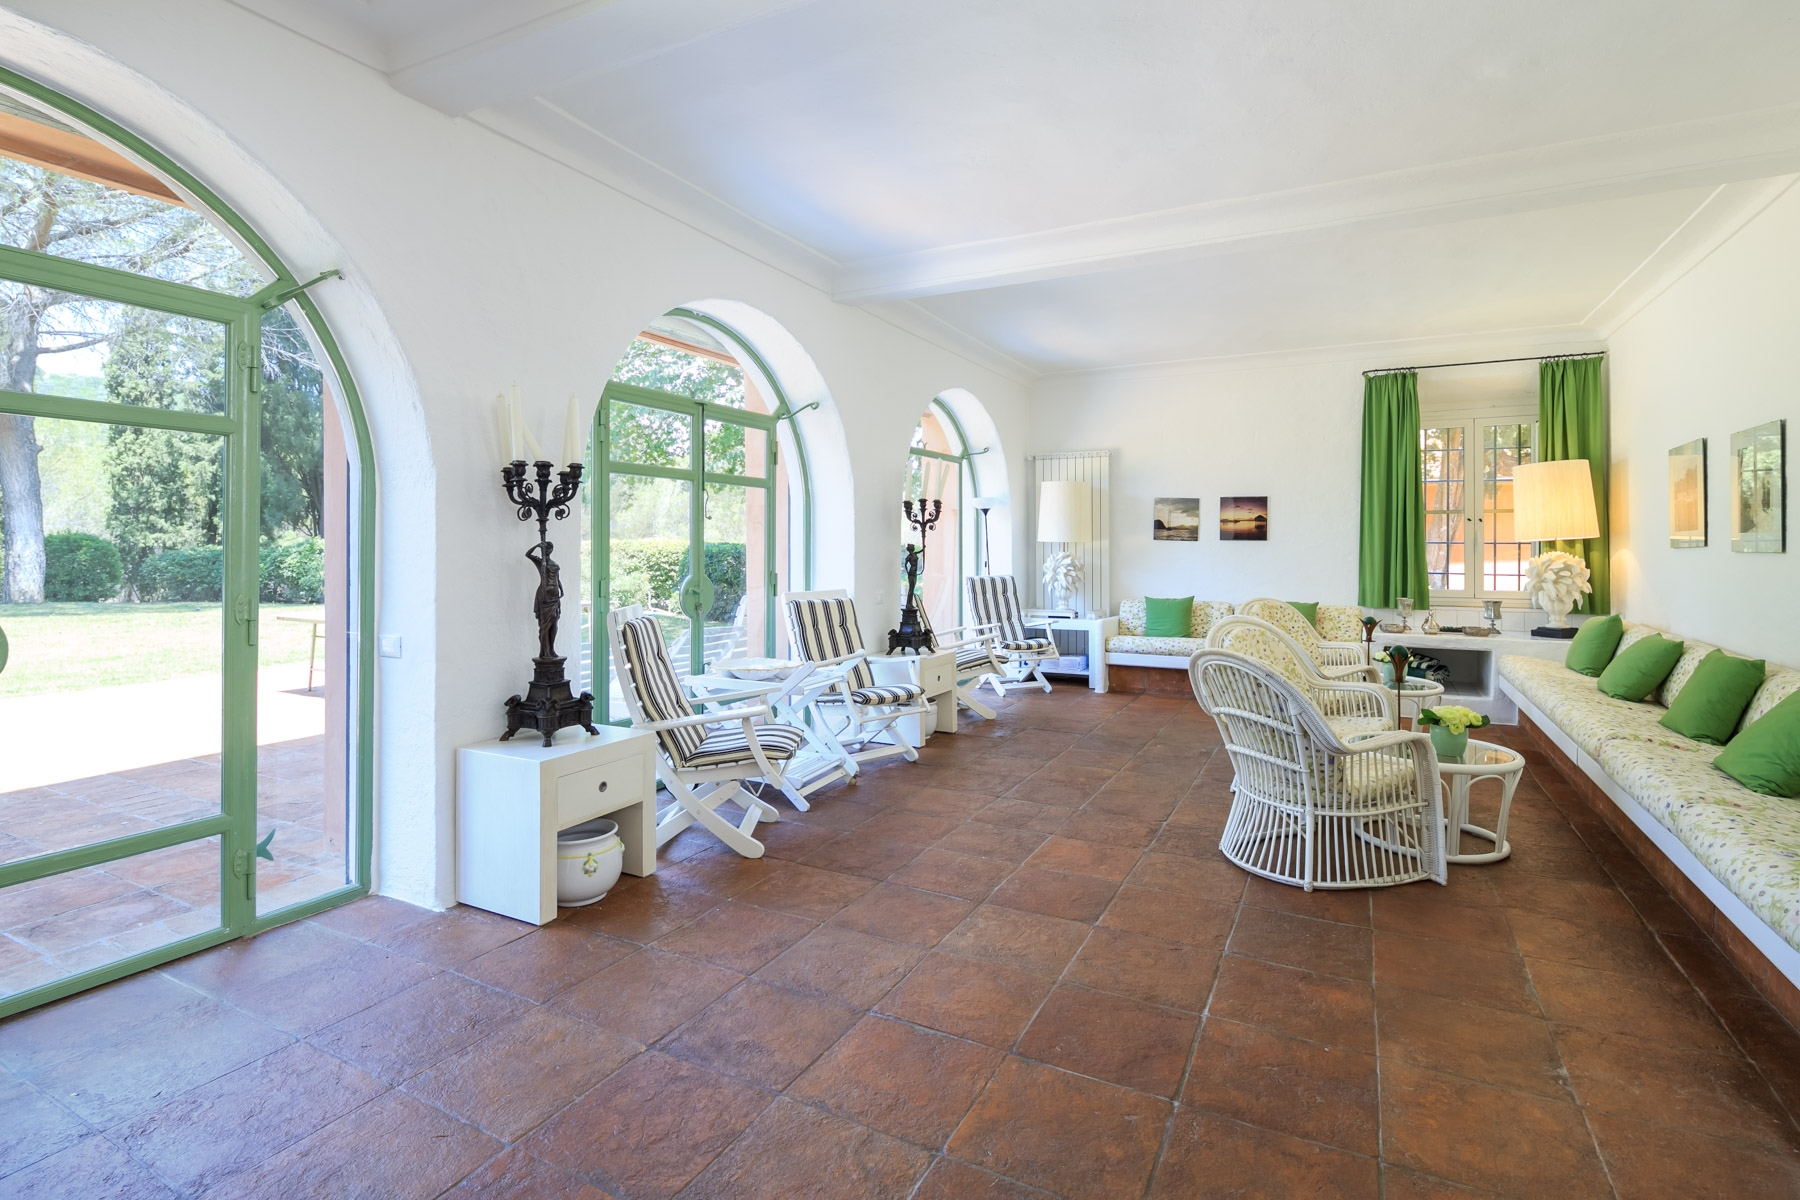 Villa in Vendita a Campiglia Marittima: 5 locali, 1100 mq - Foto 26